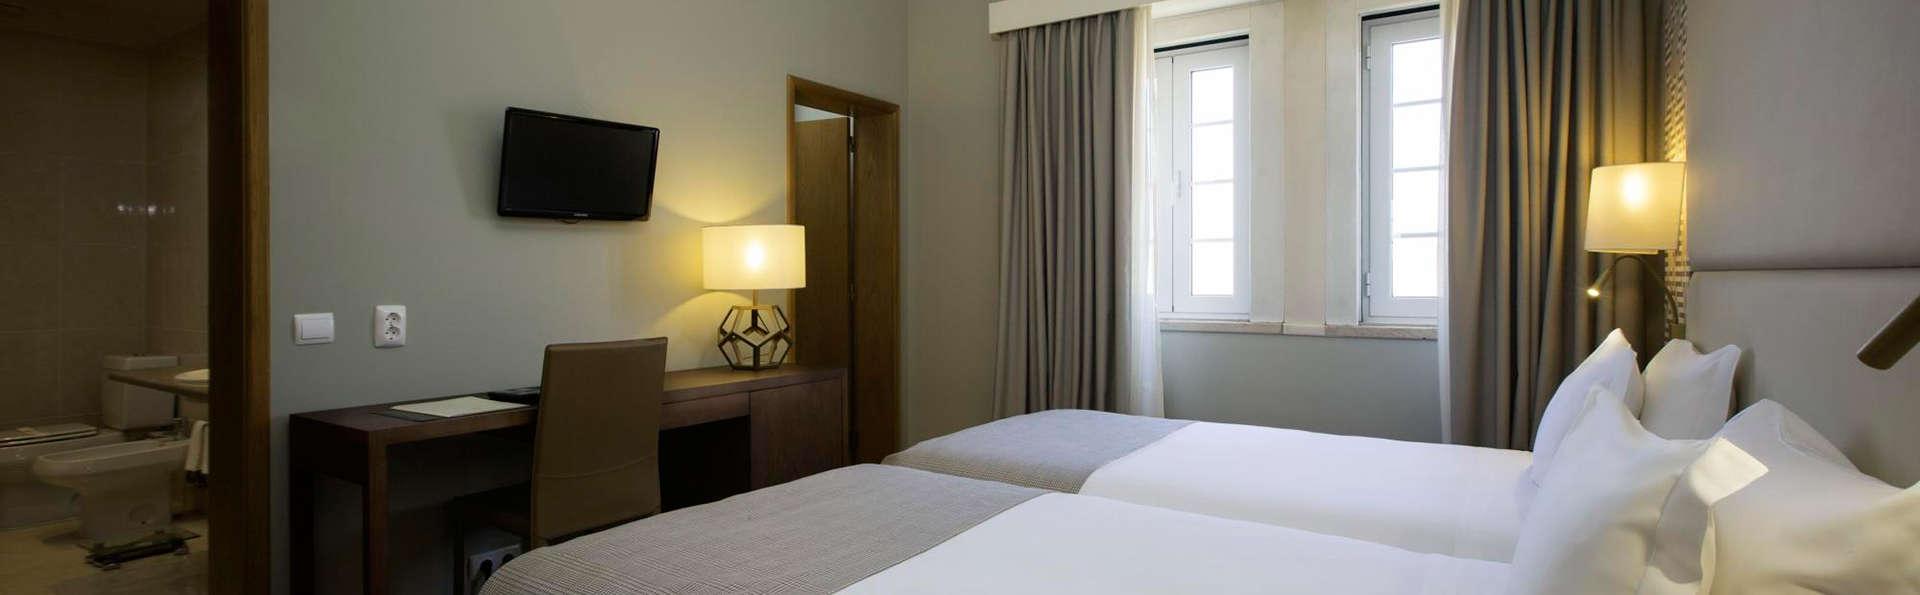 Hotel Miraparque - EDIT_fitness2.jpg